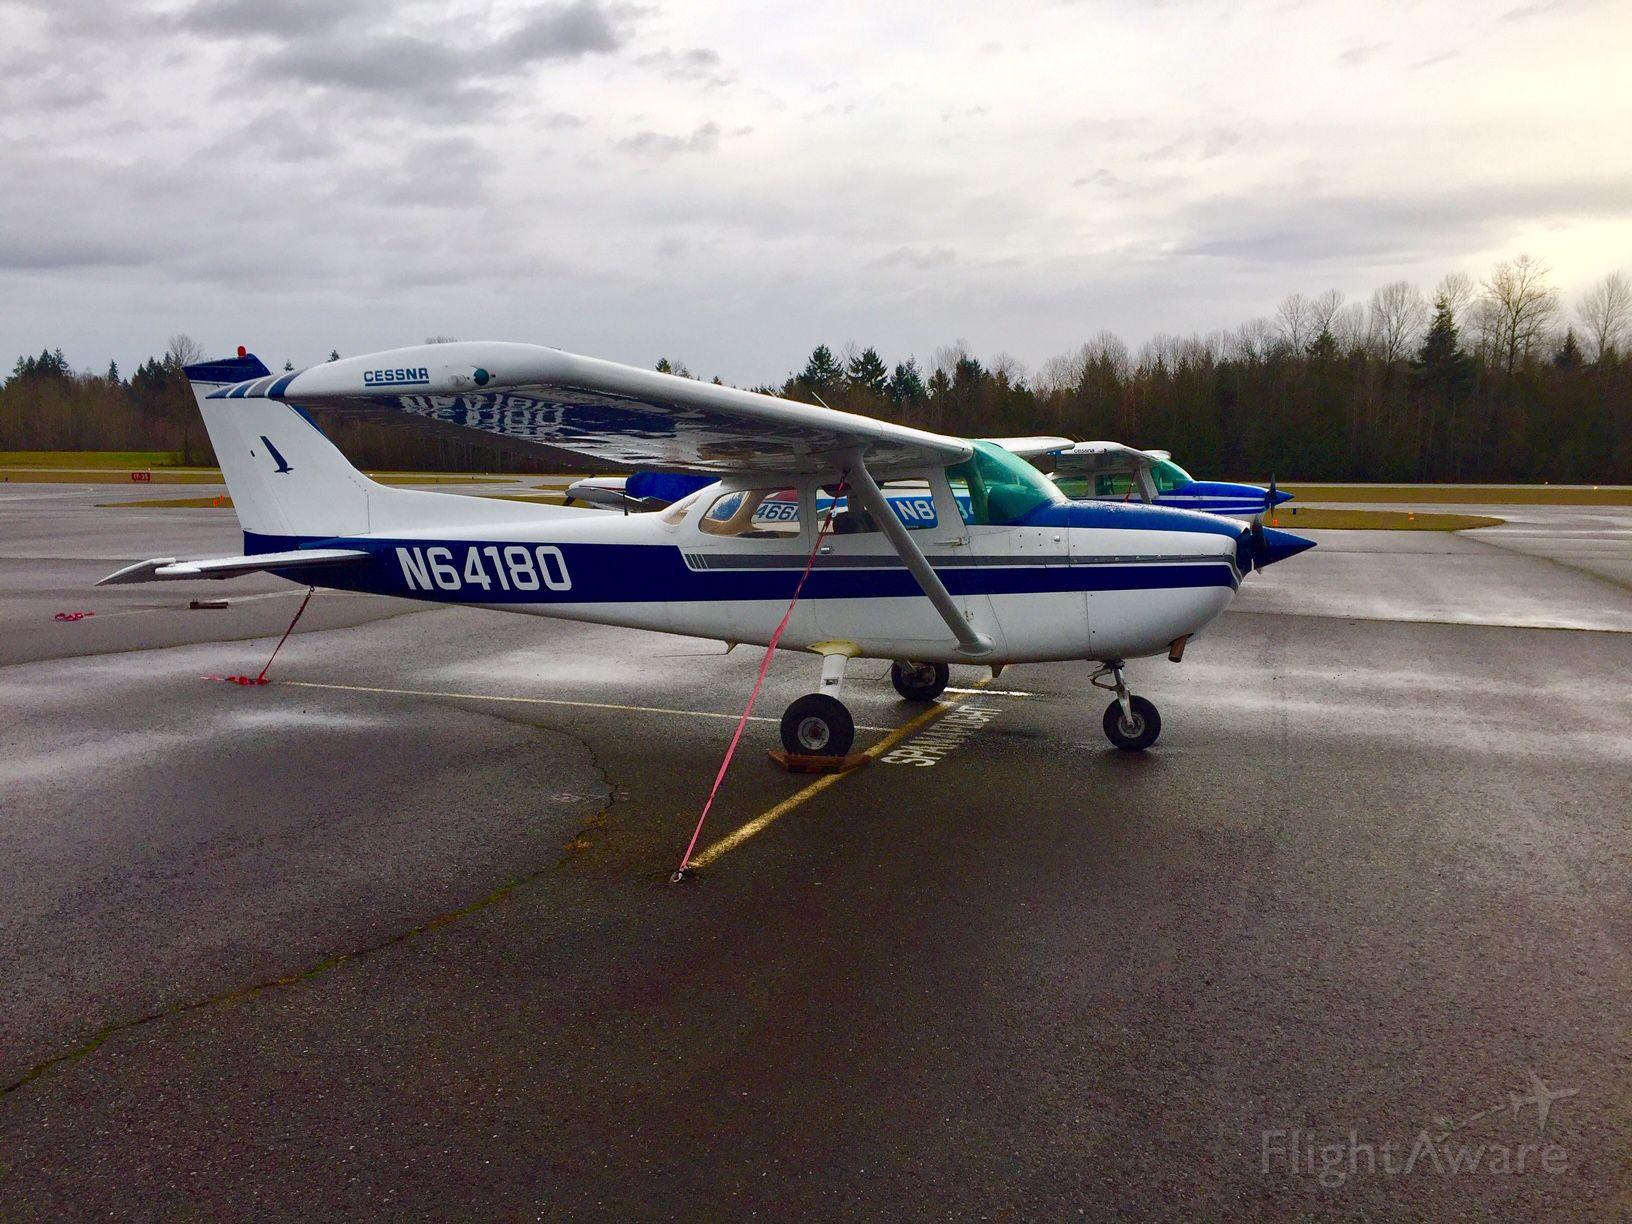 Cessna Skyhawk (N64180) - Cessna N64180 on a chilly Washington morning.